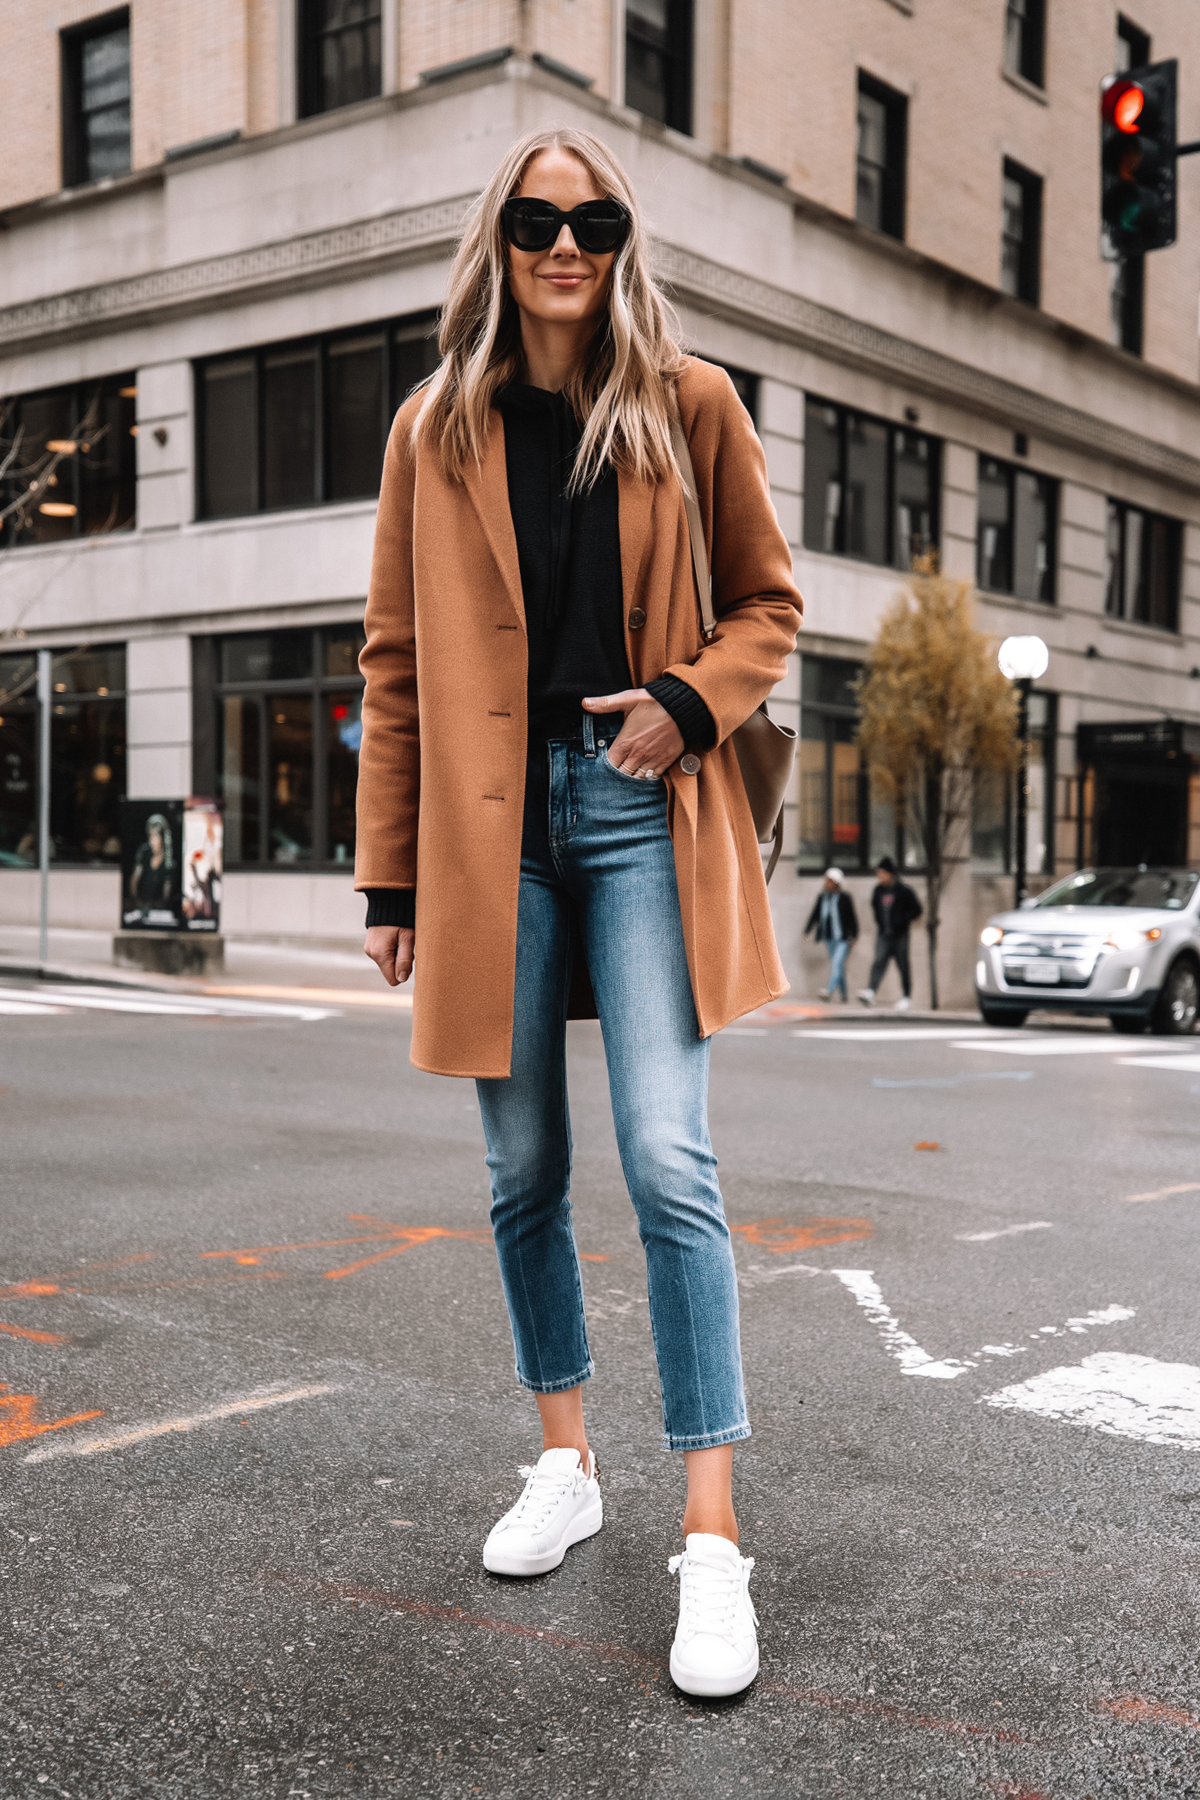 Fashion Jackson Wearing Banana Republic Camel Coat Black Hoodie Sweater Denim Ankle Jeans White Sneakers Street Style